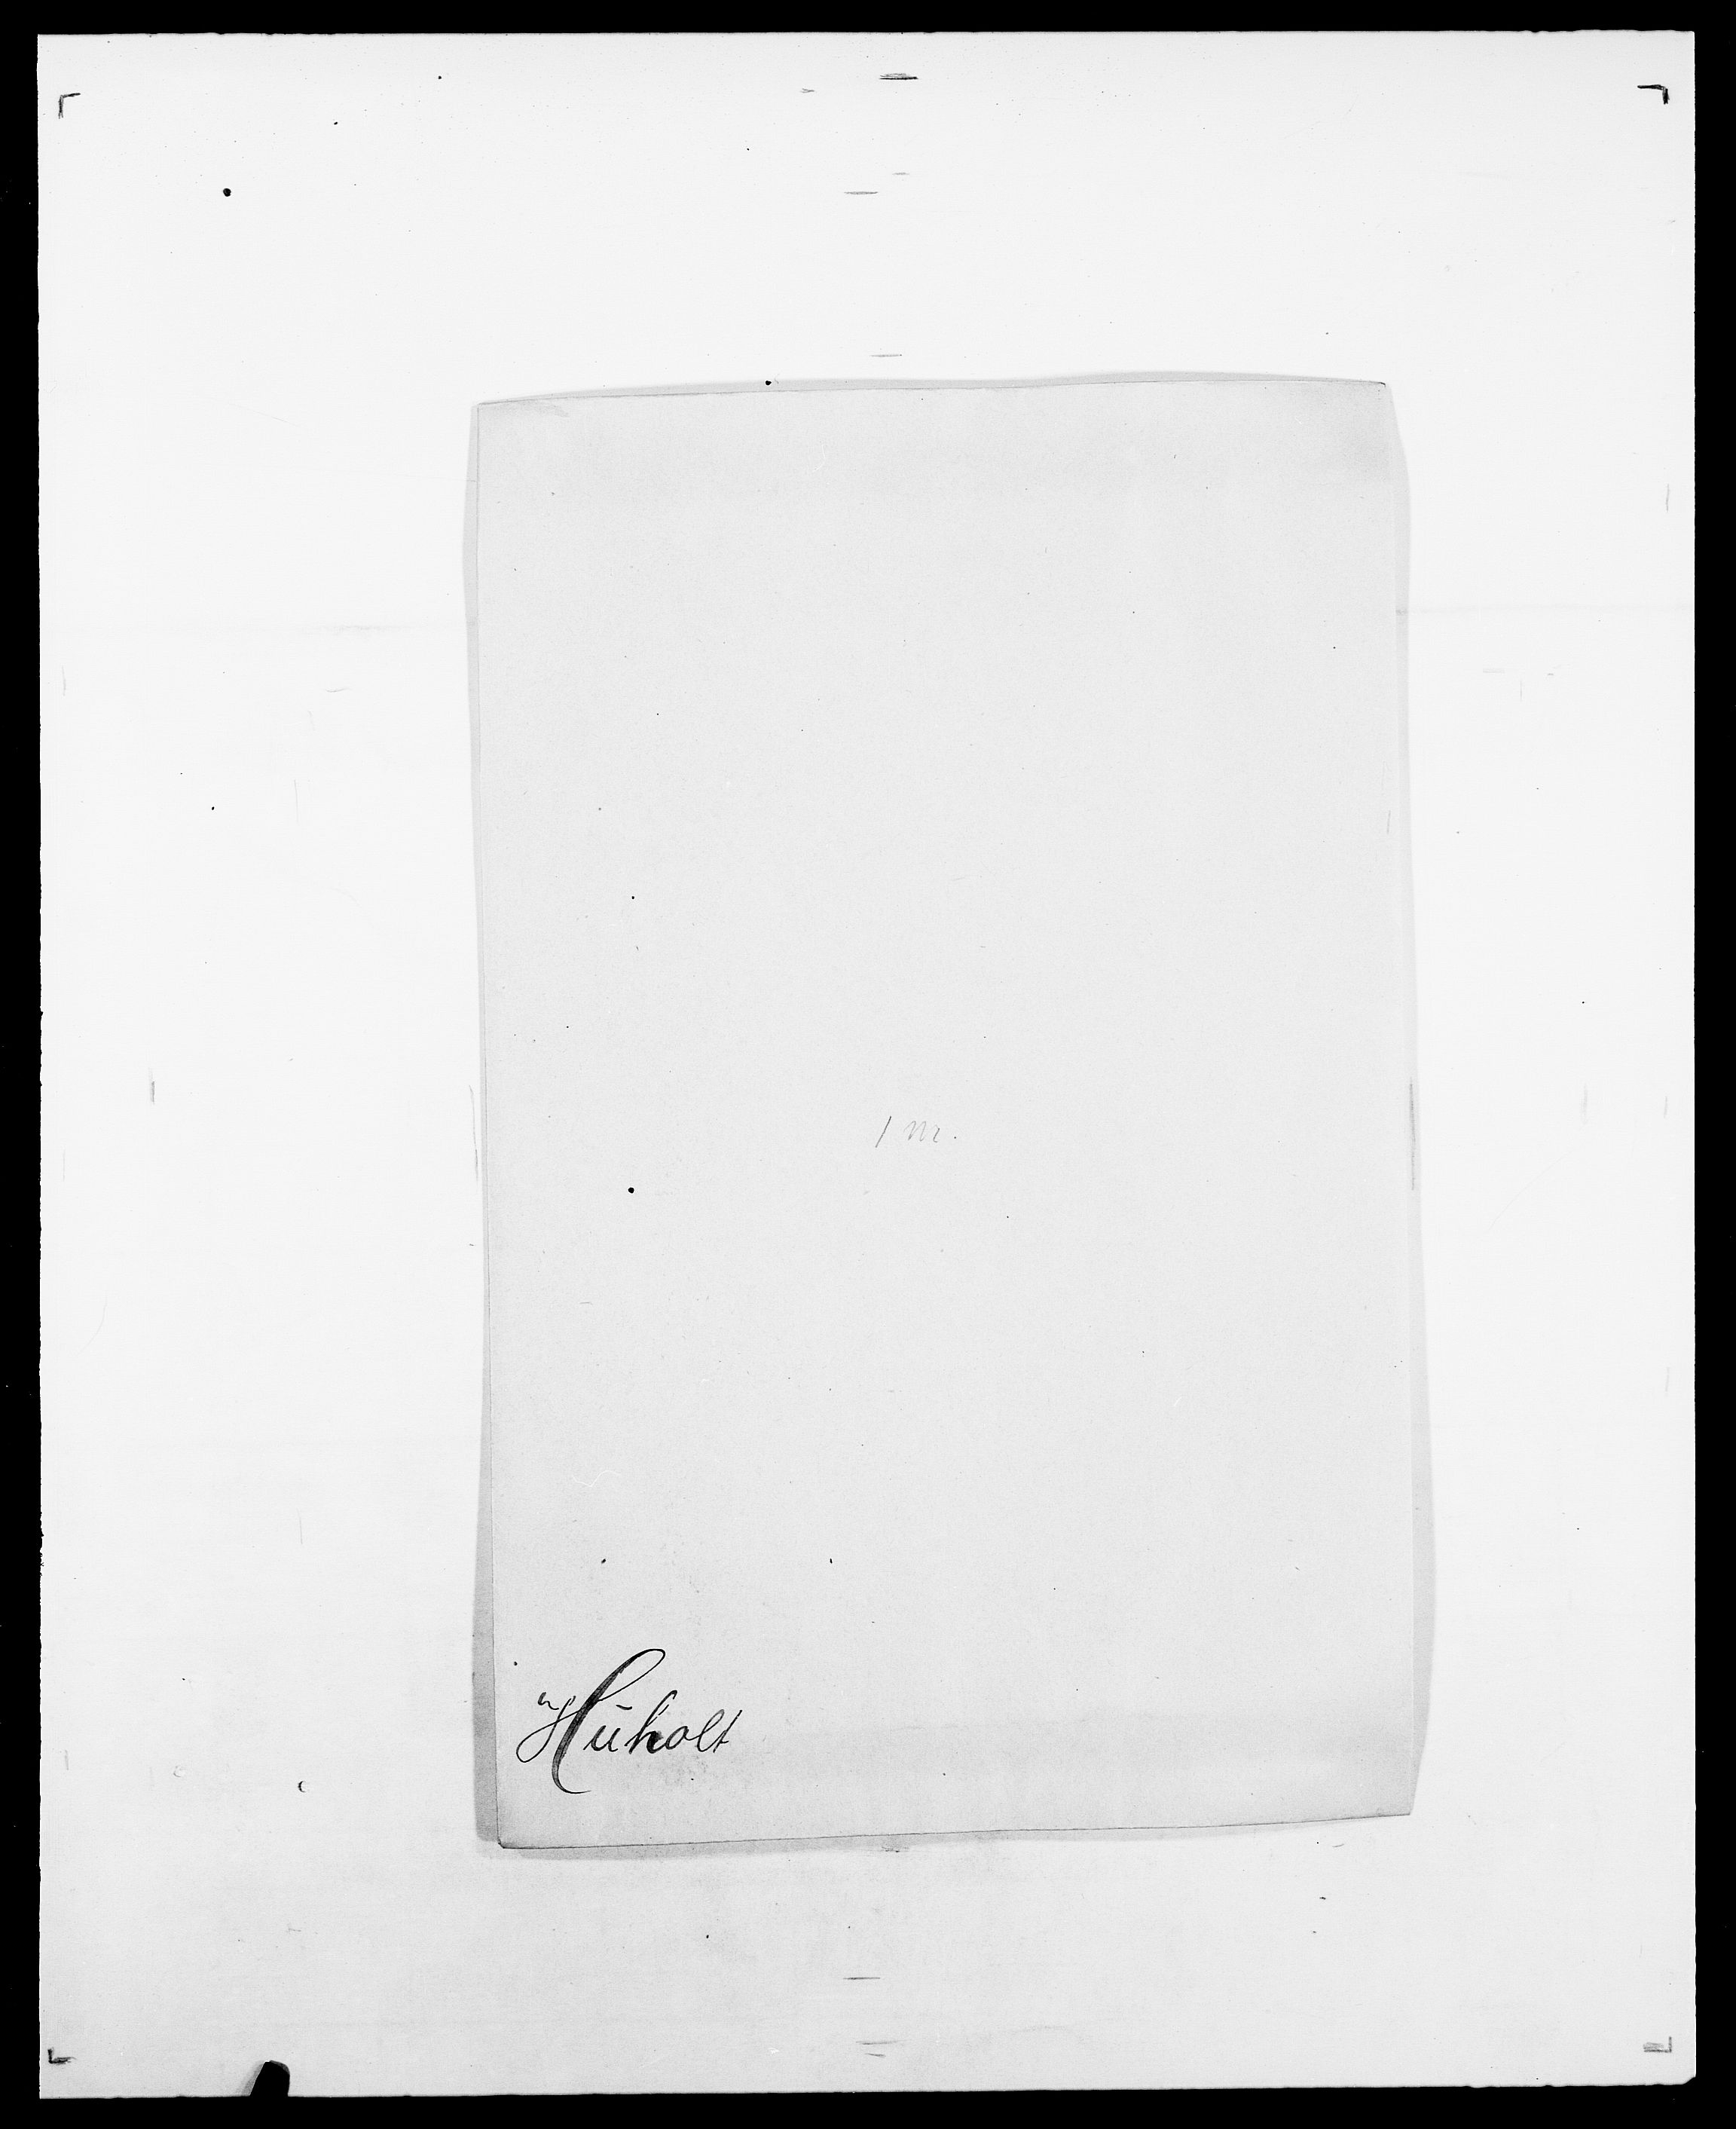 SAO, Delgobe, Charles Antoine - samling, D/Da/L0019: van der Hude - Joys, s. 34